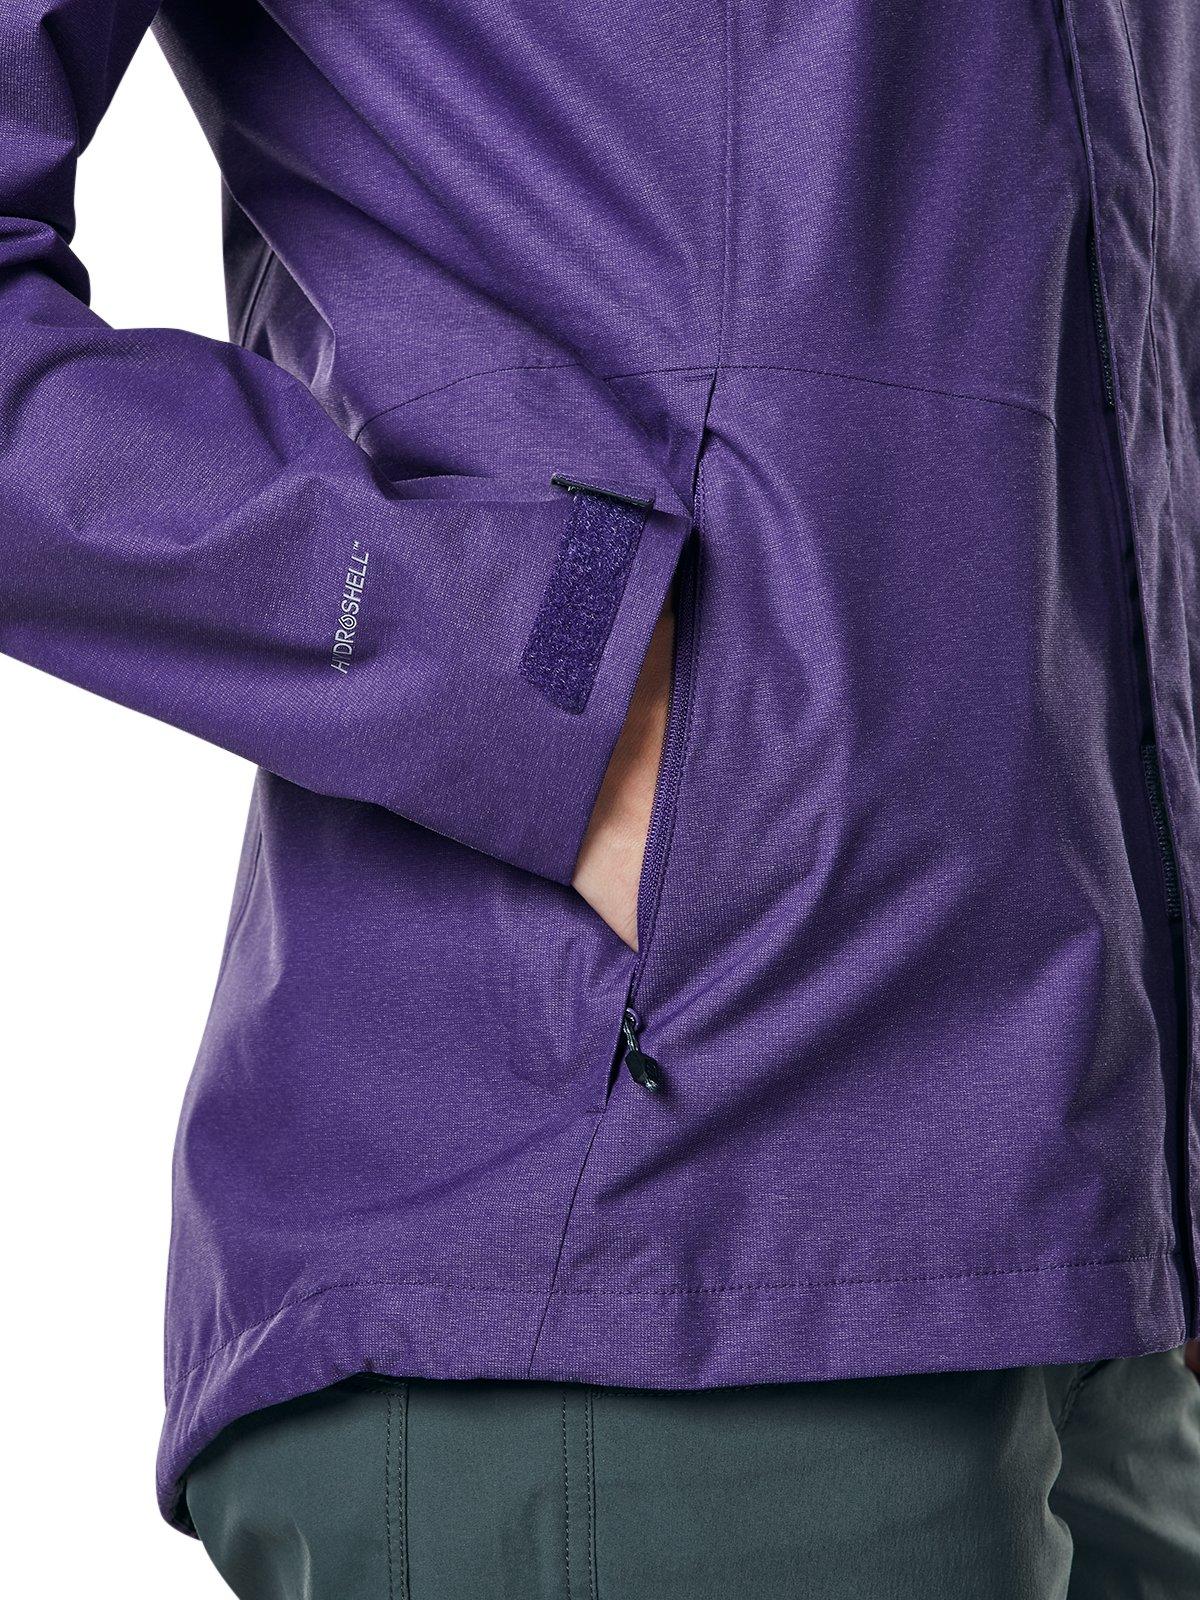 91 HGOWFcXL - Berghaus Women's Elara Waterproof Jacket